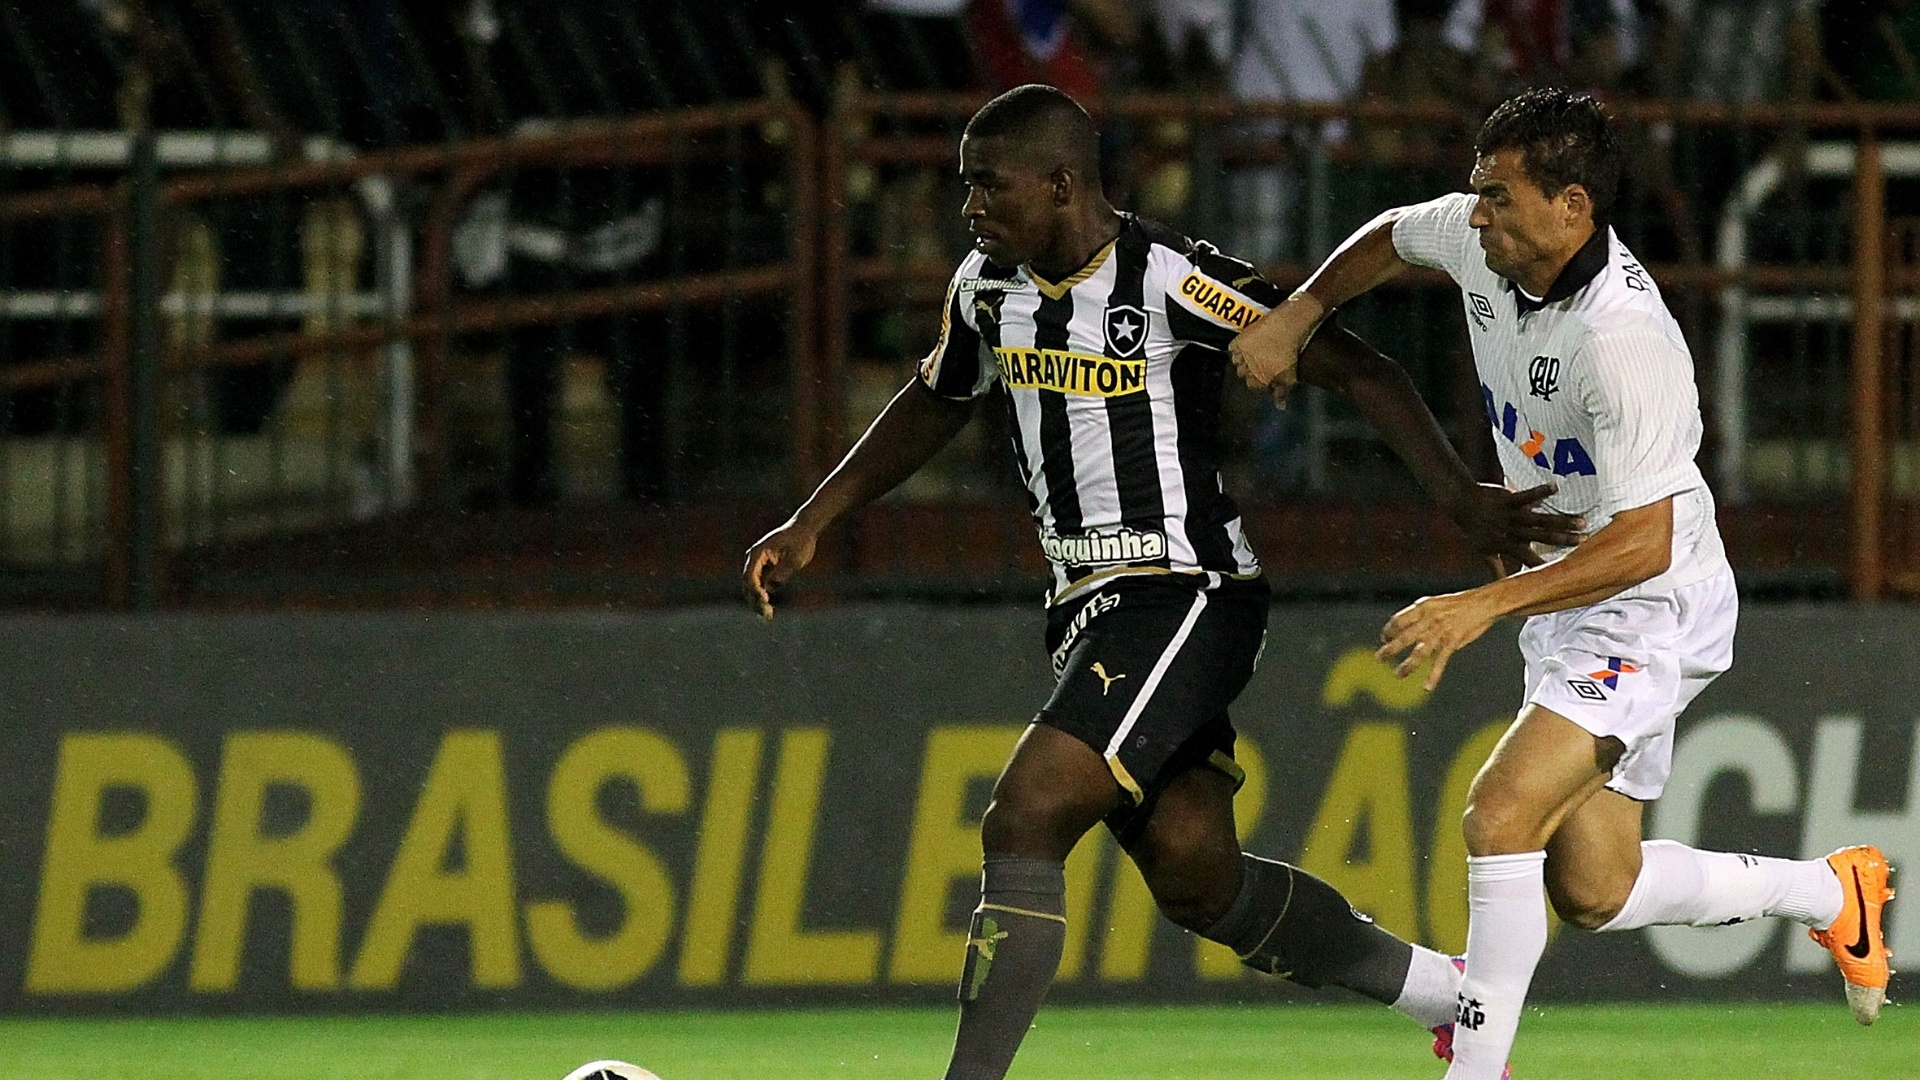 Yuri Mamuti carrega bola marcado de perto por defensor do Atlético-PR